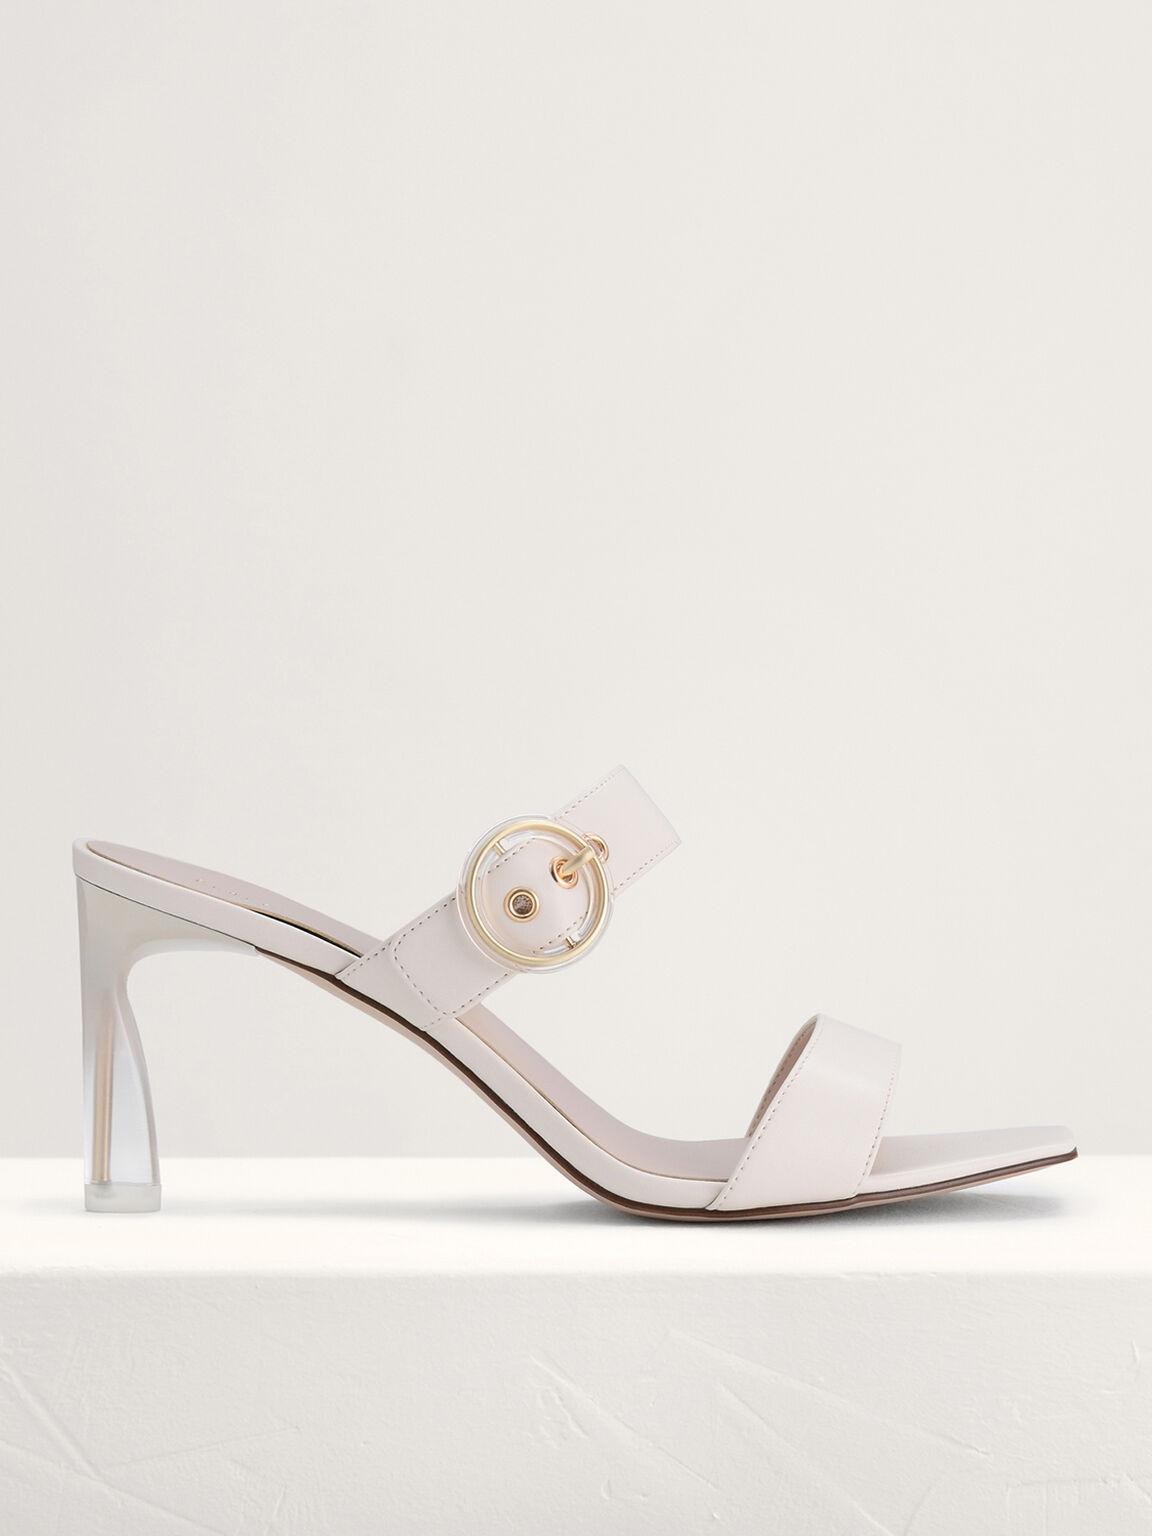 Buckled Heeled Sandals, Cream, hi-res